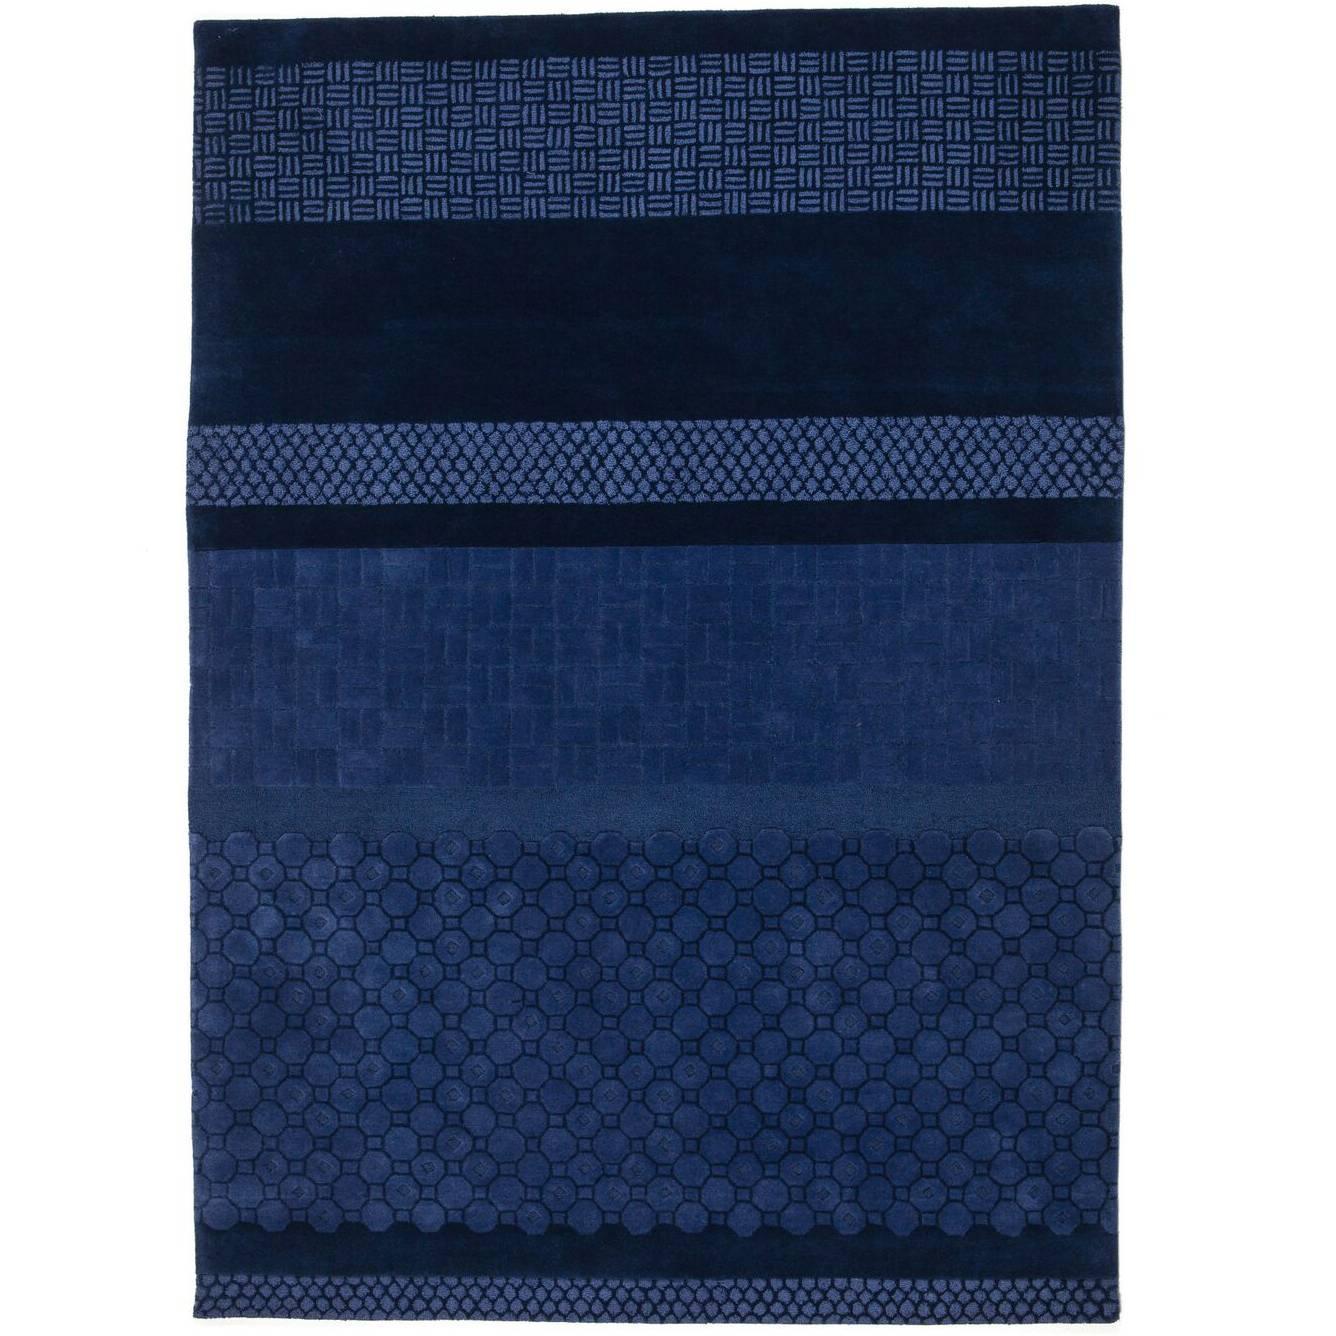 Blue Jie Hand-Tufted Wool Area Rug by Neri & Hu Large